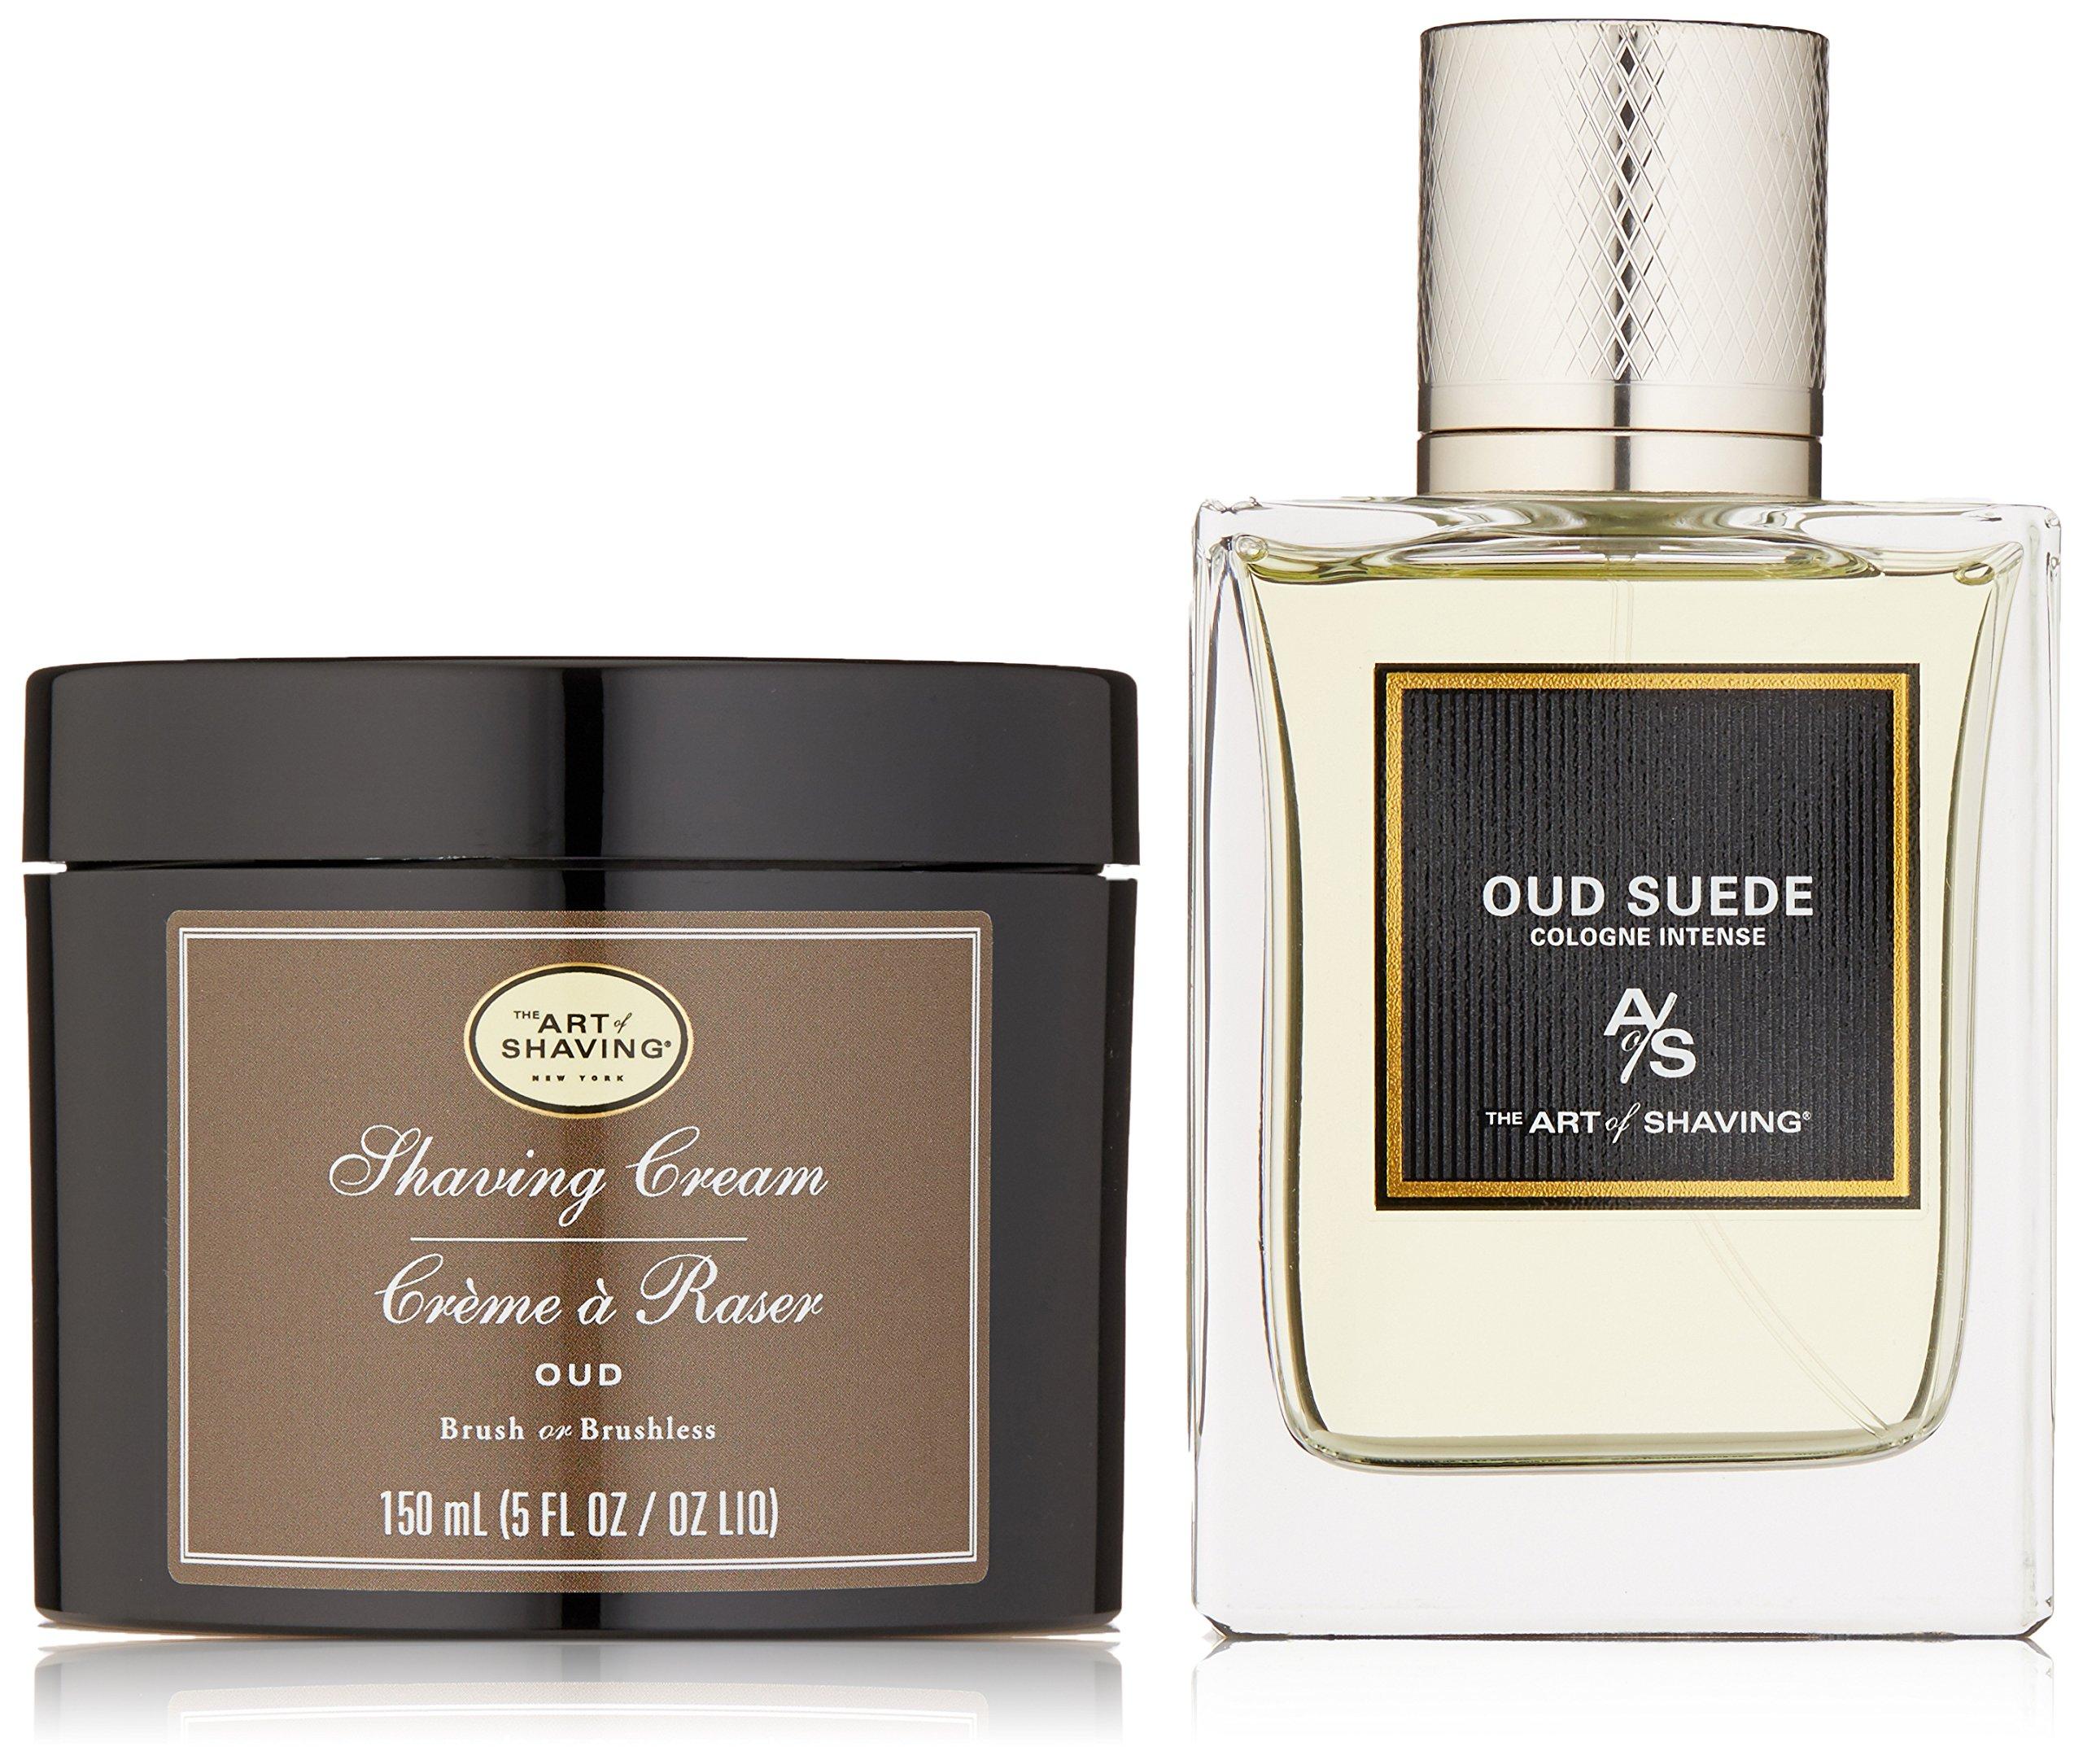 The Art of Shaving 2 Piece Fragrance Gift Set, Oud by The Art of Shaving